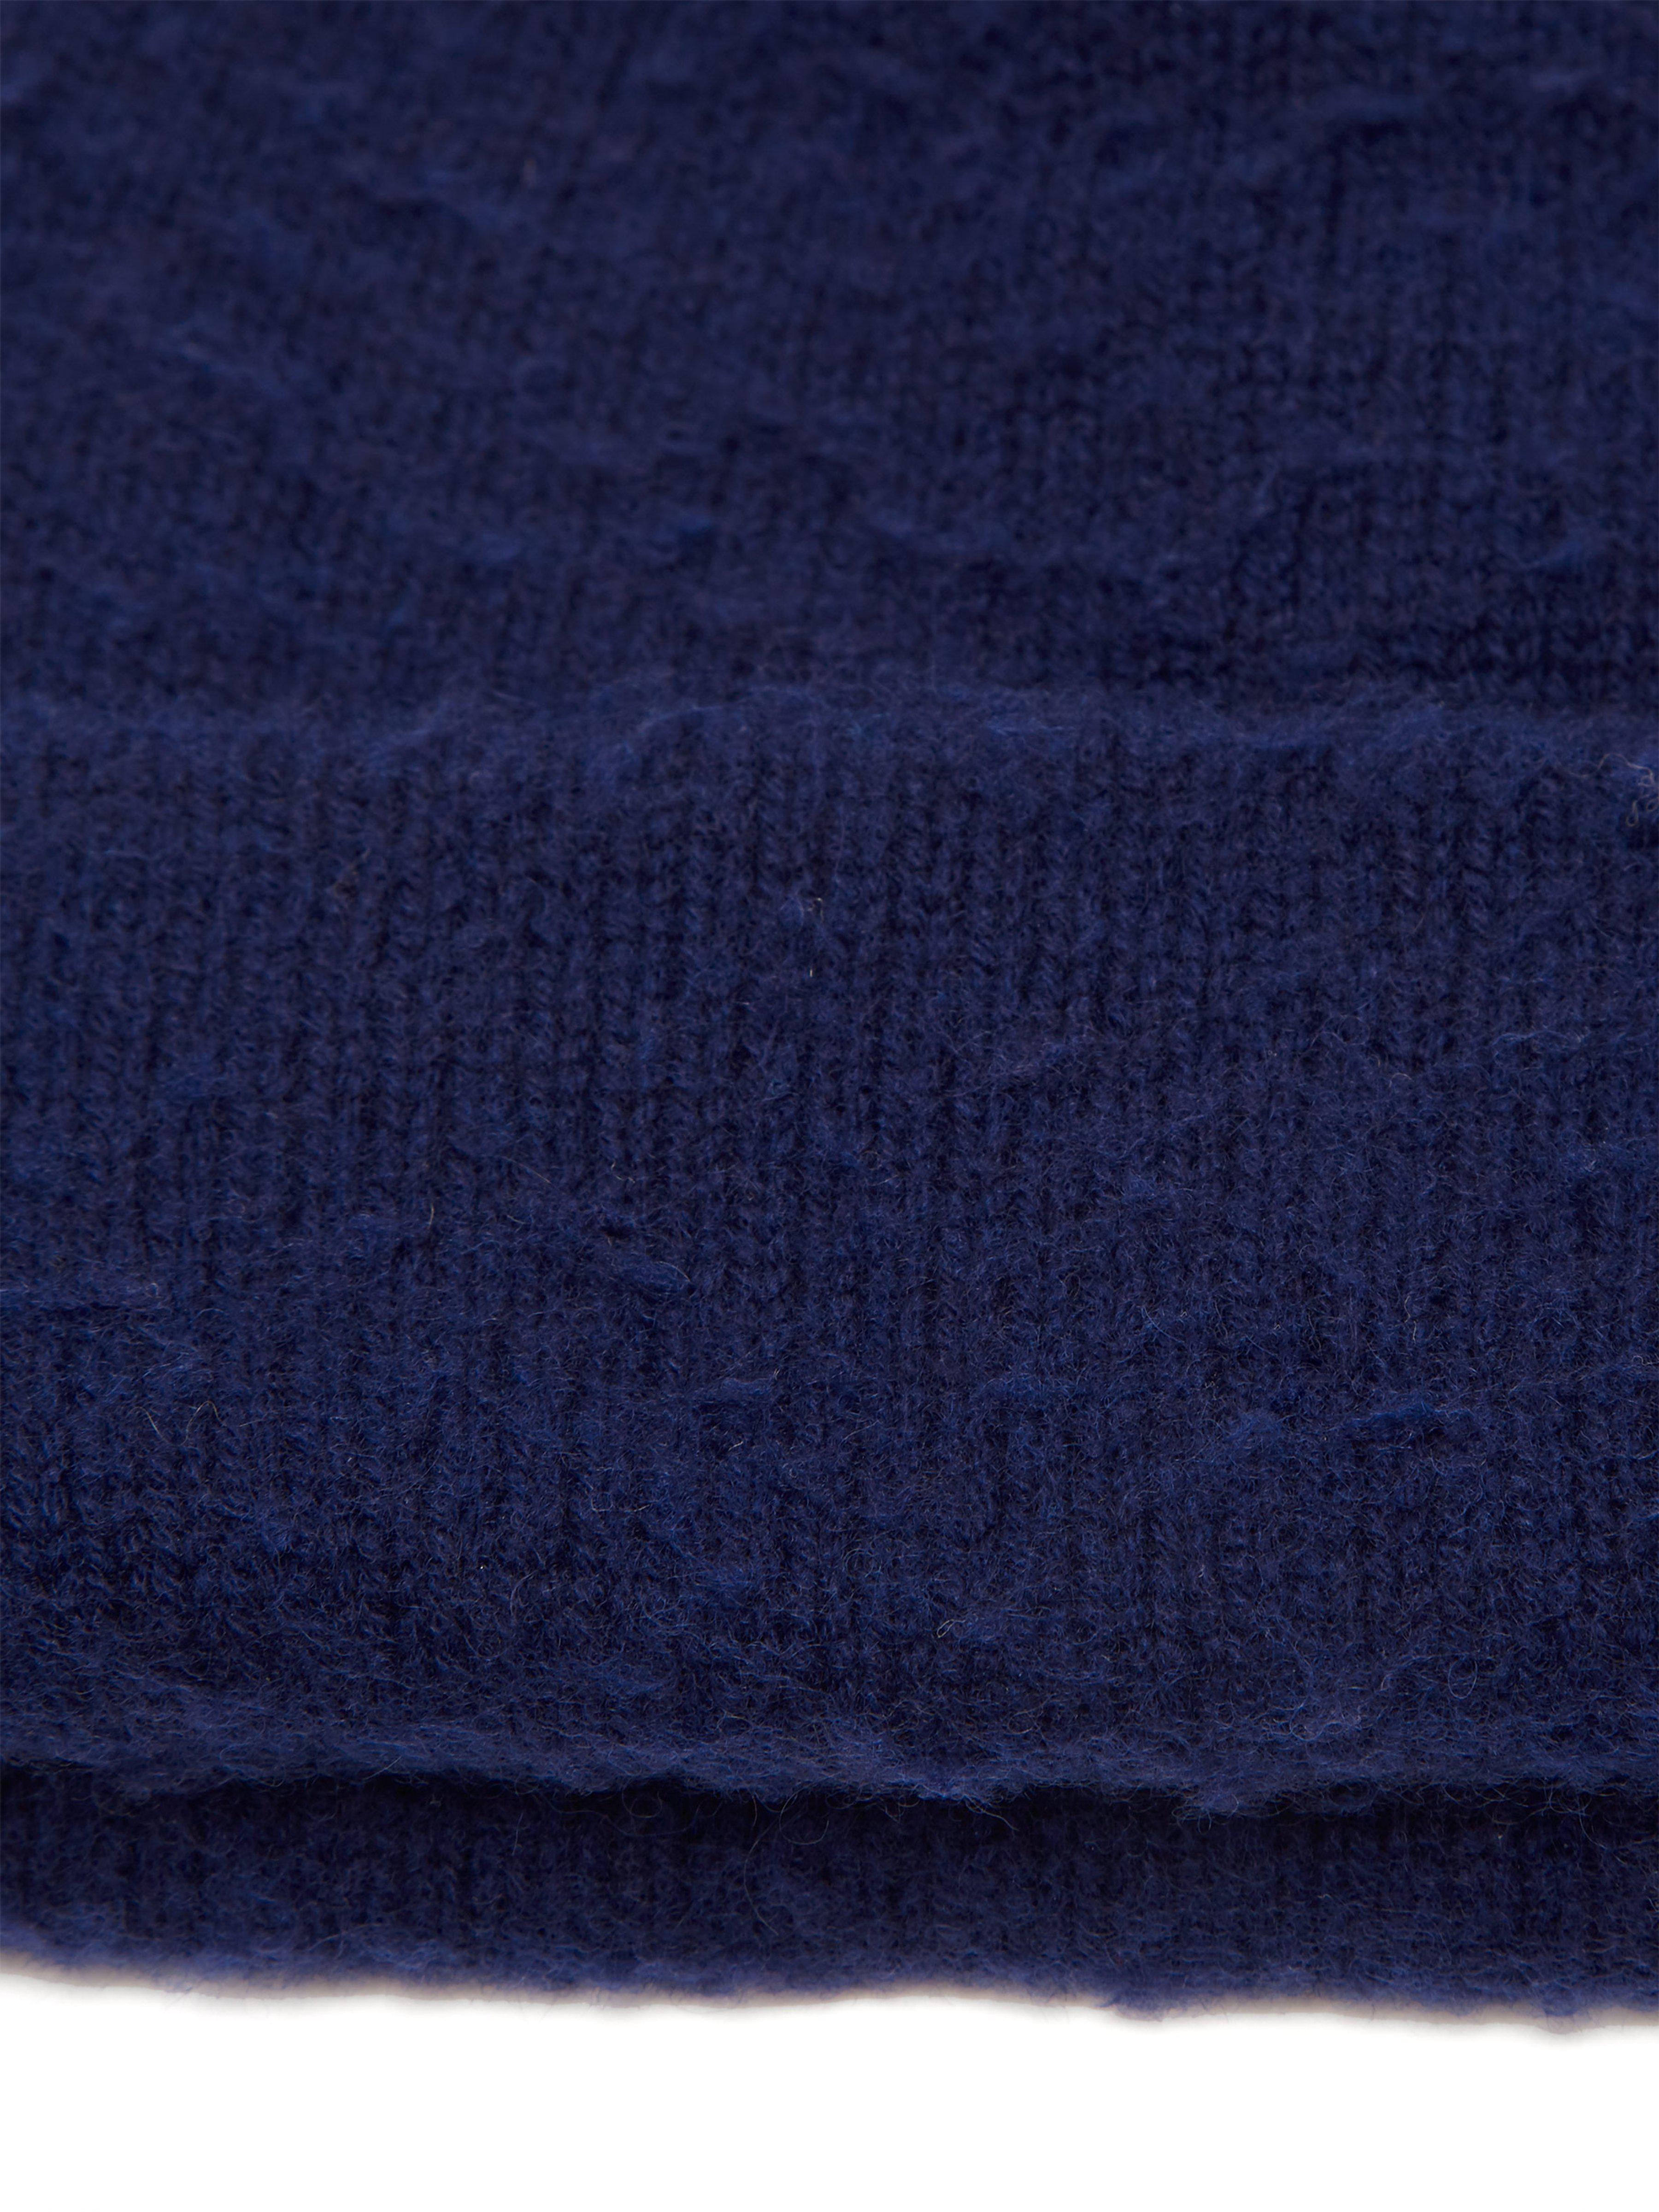 Acne - Blue Pilled Wool Blend Beanie Hat for Men - Lyst. View fullscreen 07eb437619f6